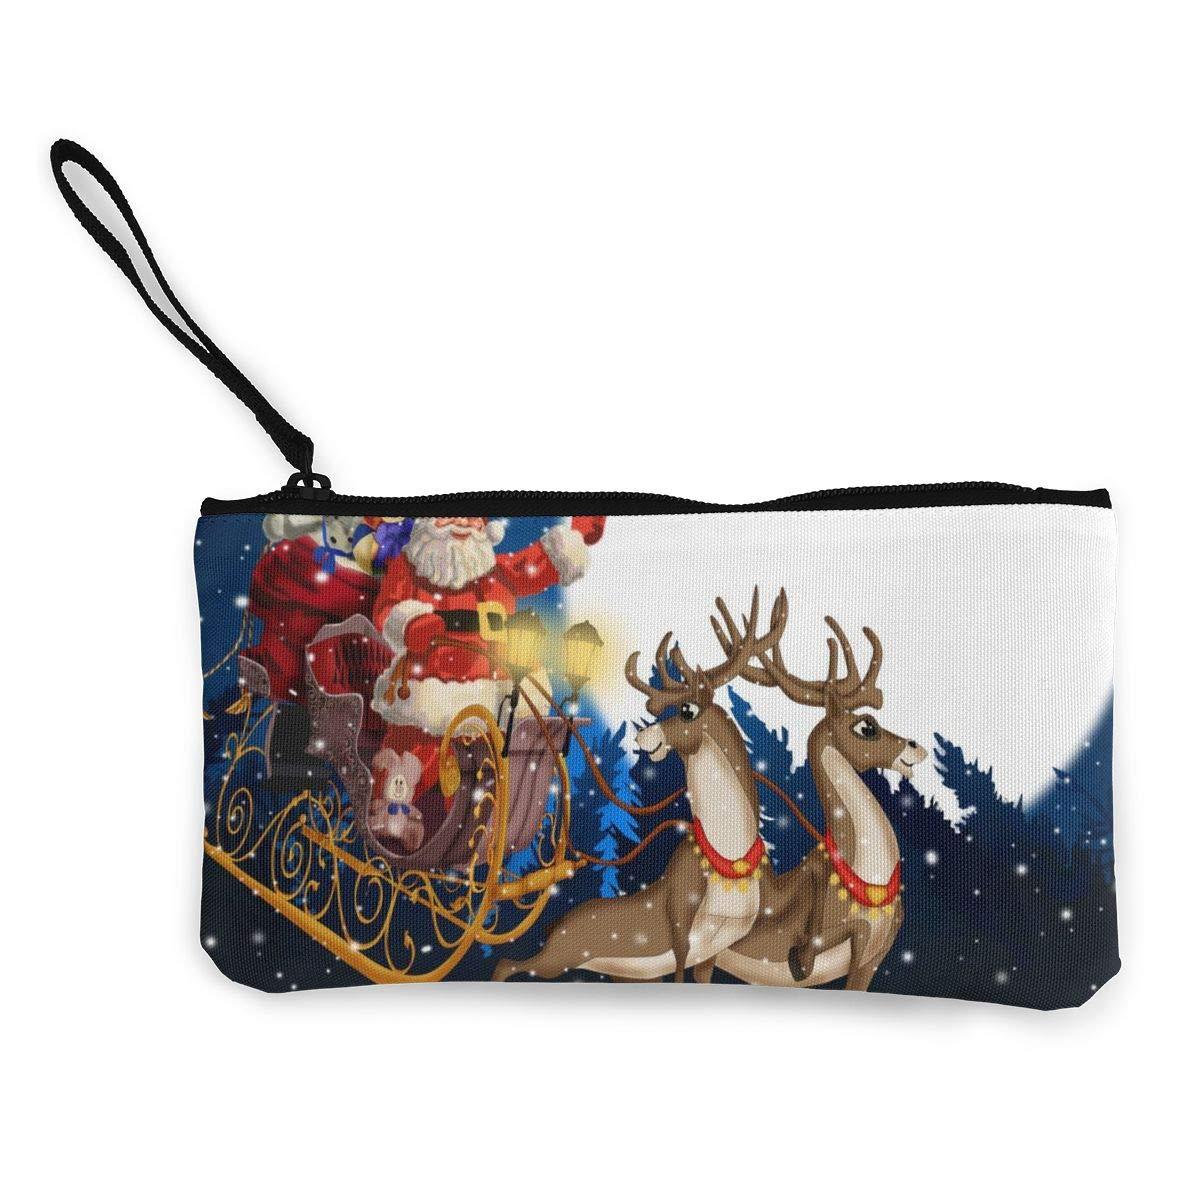 Canvas Cash Coin Purse,Reindeer Pulling Santa Claus Print Make Up Bag Zipper Small Purse Wallets